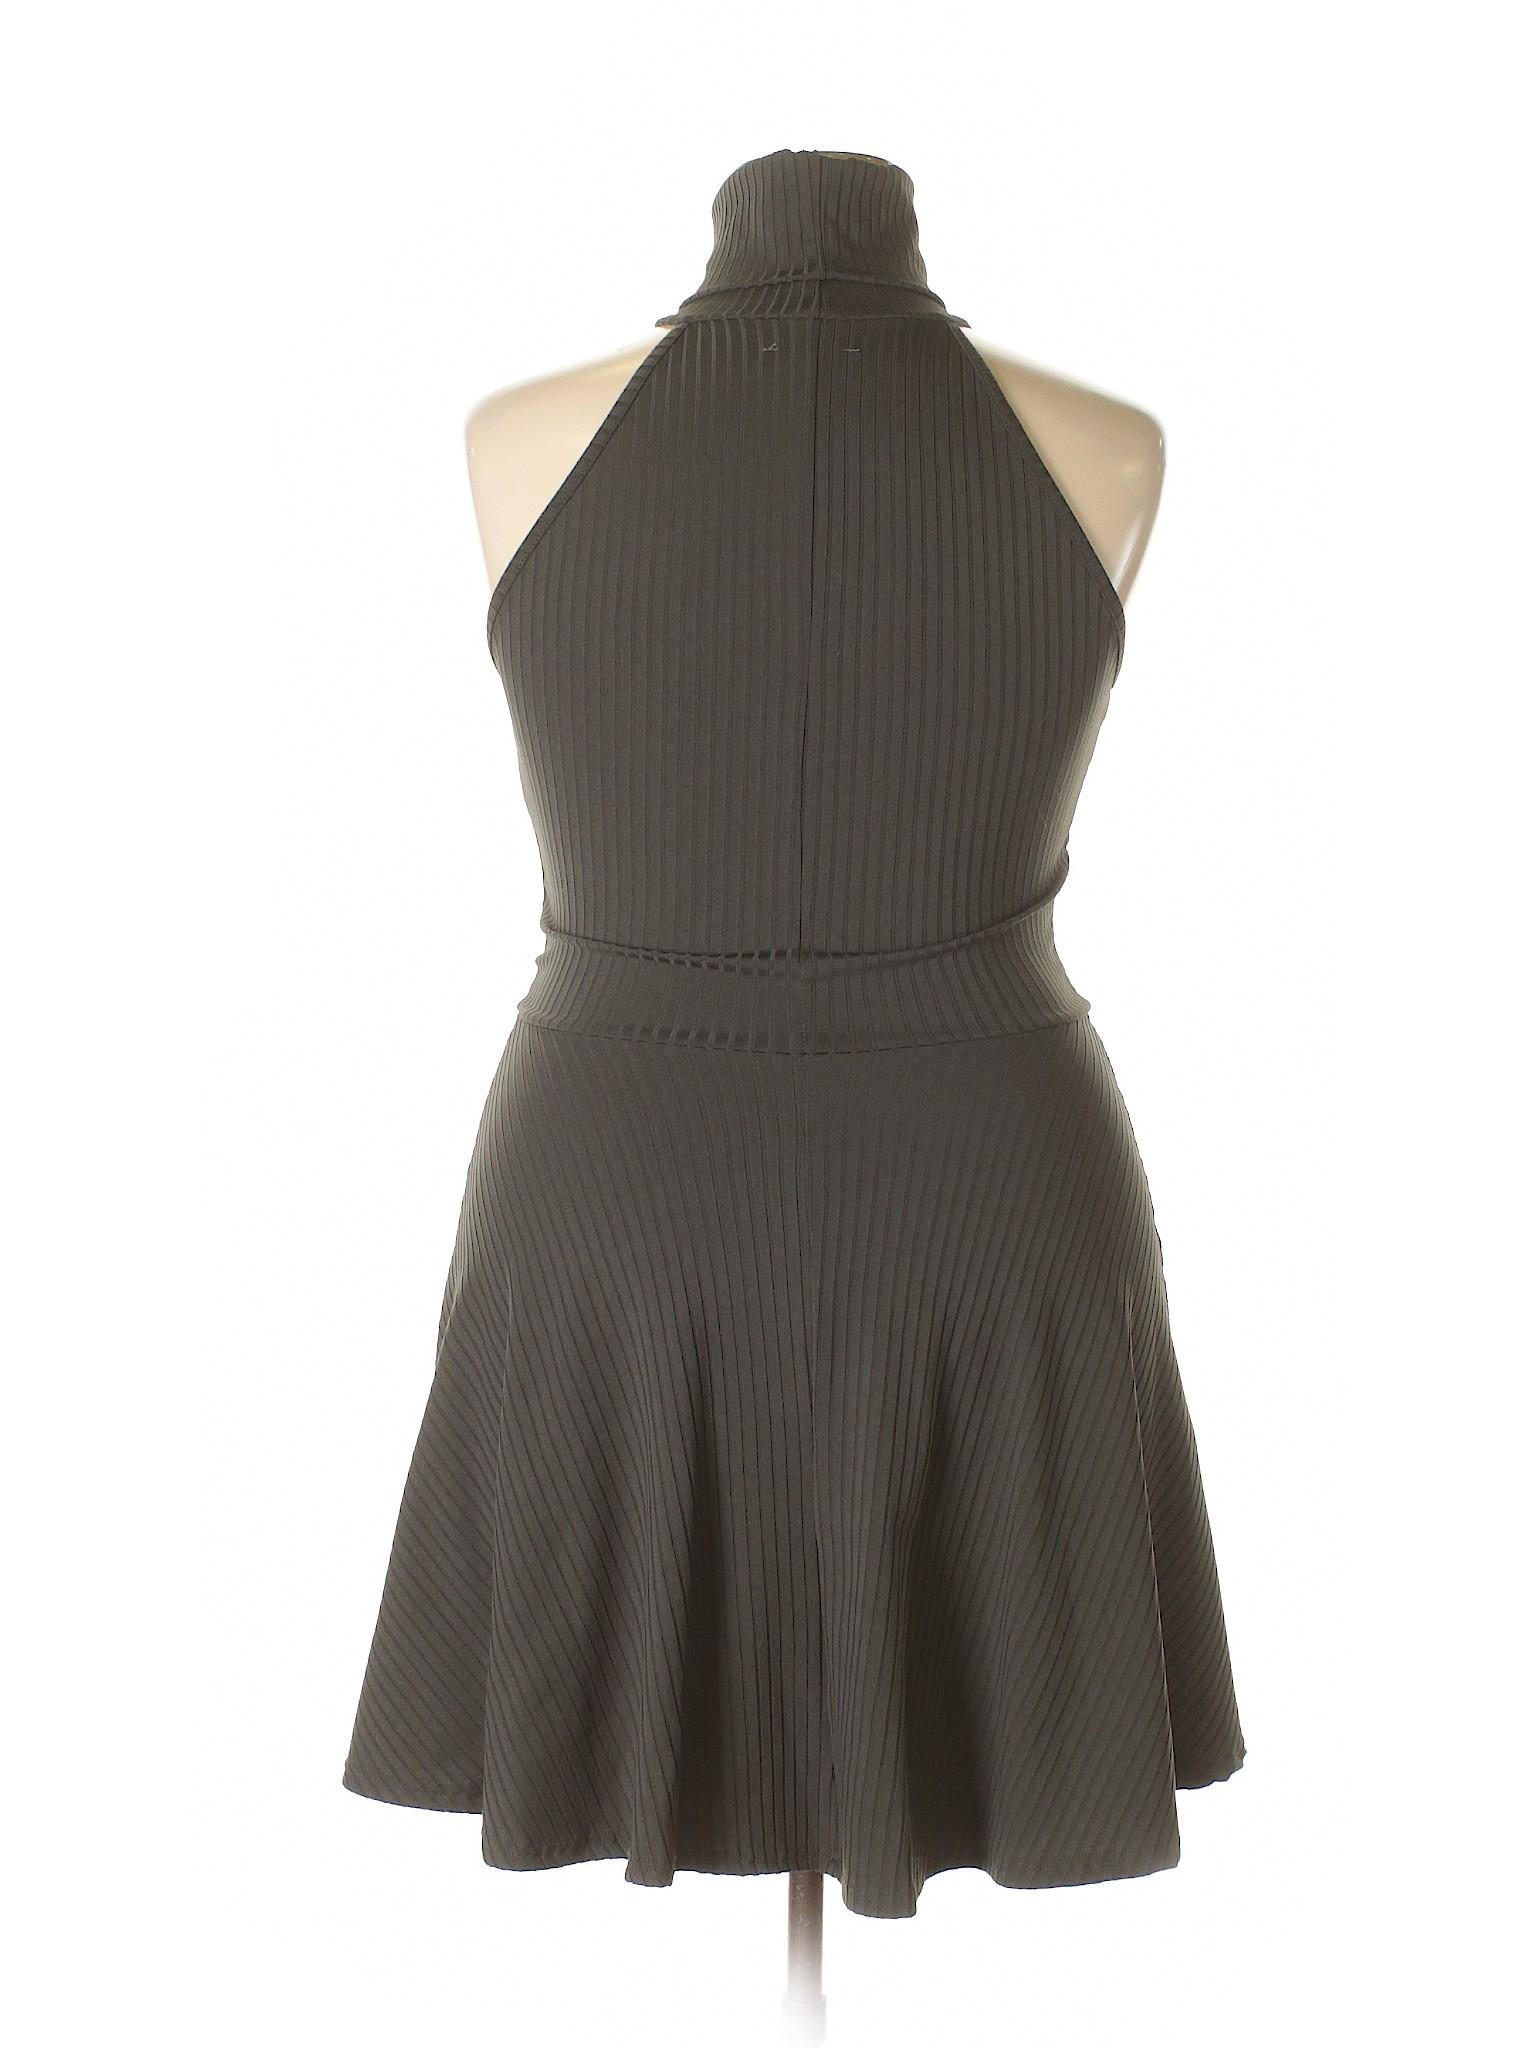 Selling L Dress Casual Selling Dress Club Casual Selling Casual L Club L Club 5qHTq4